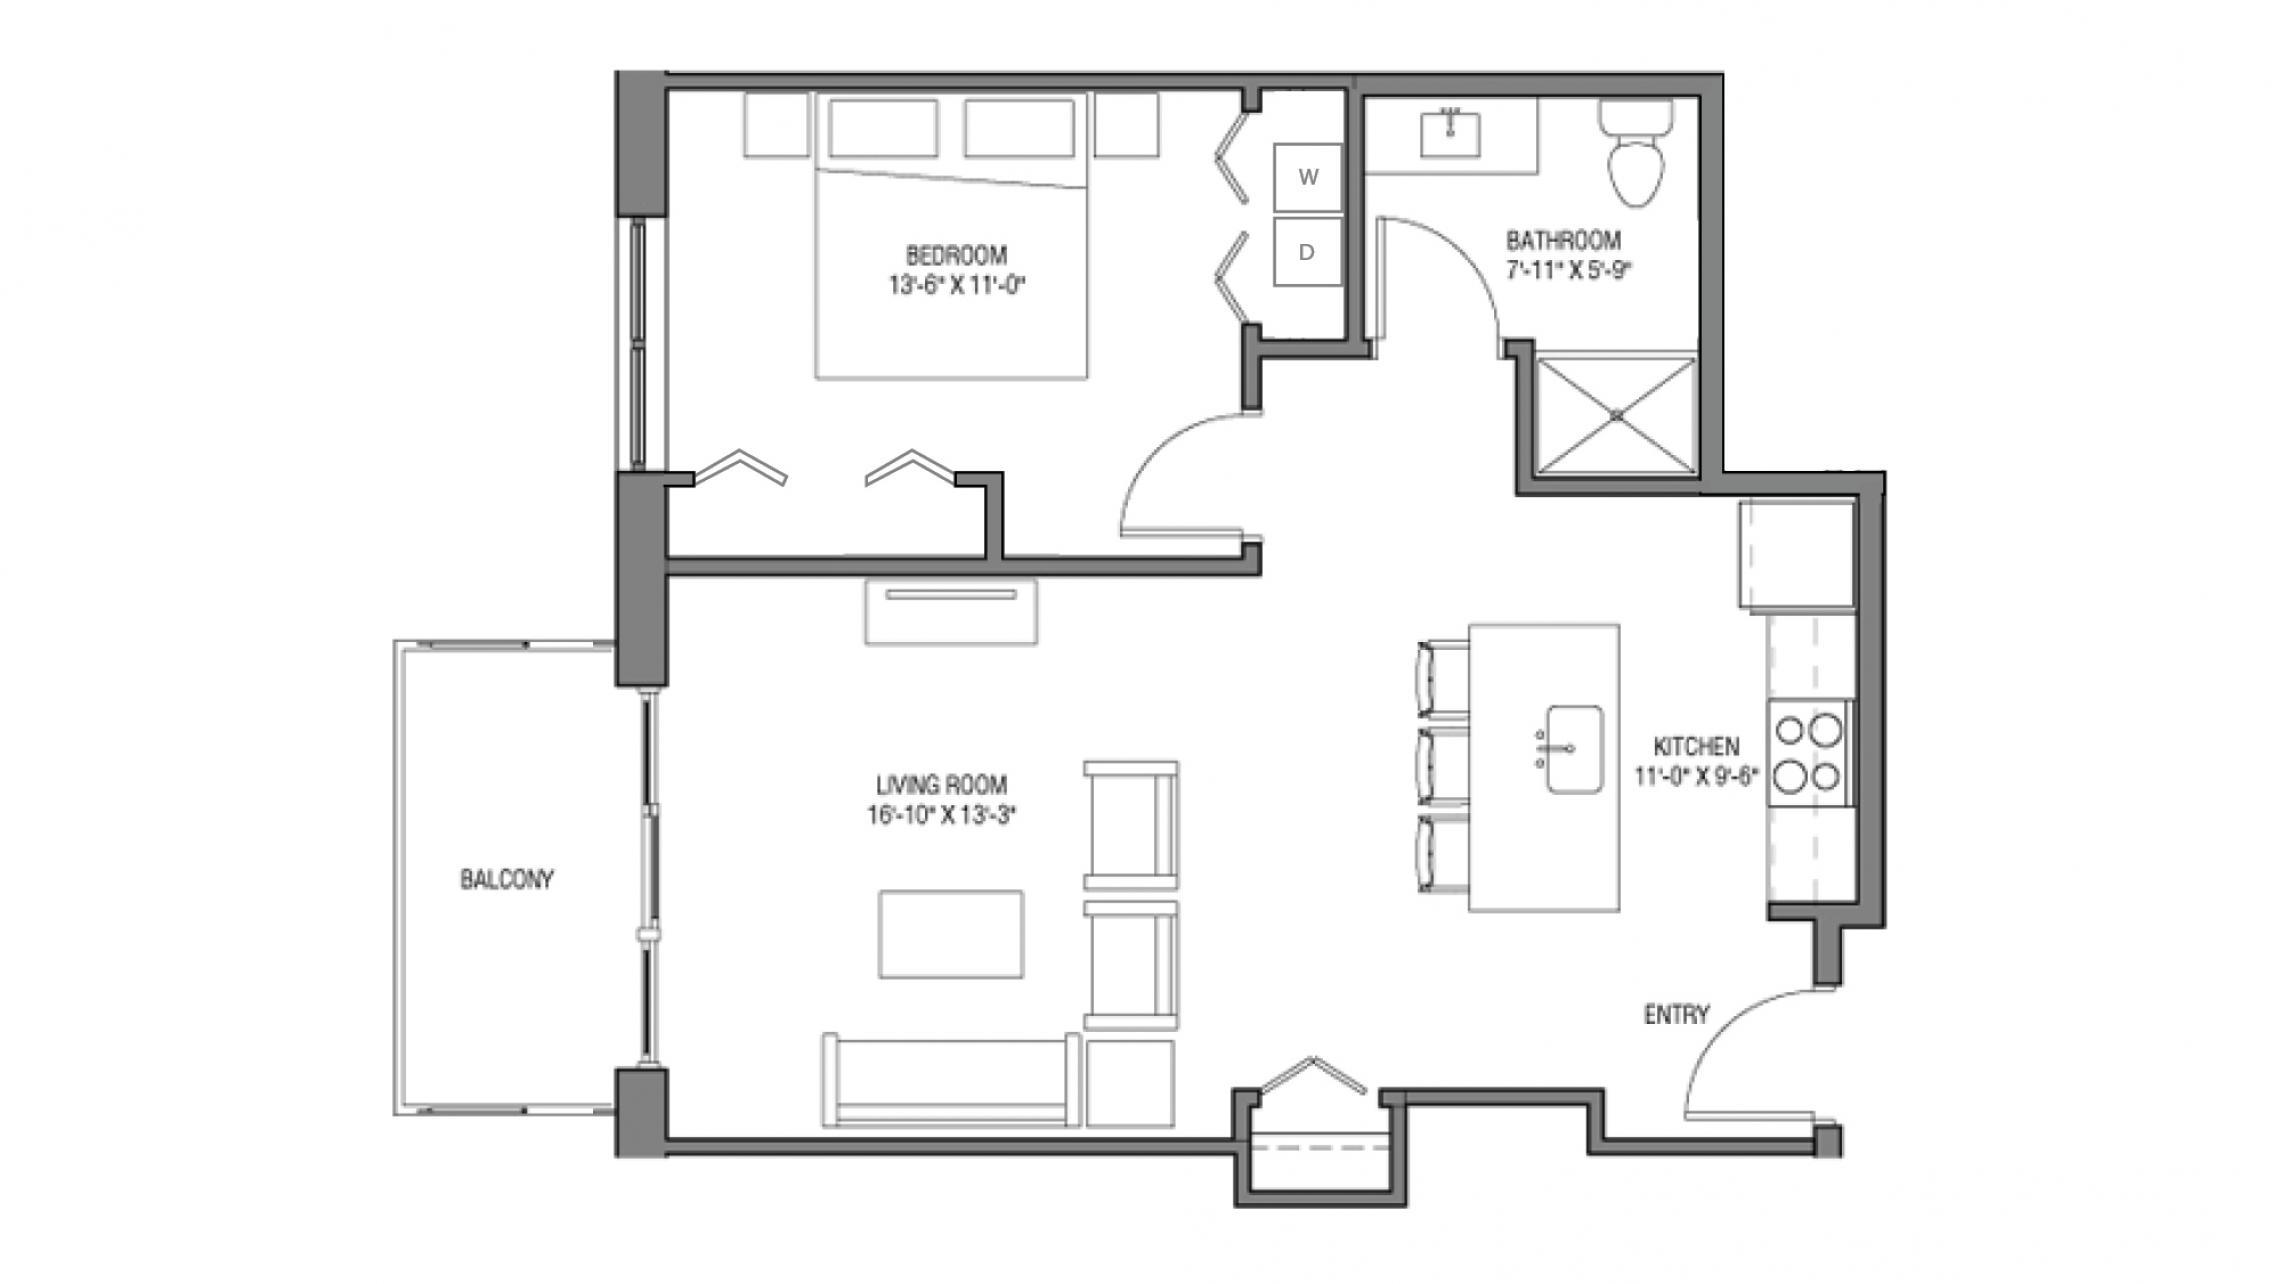 ULI One Bedroom Accessible Floorplan